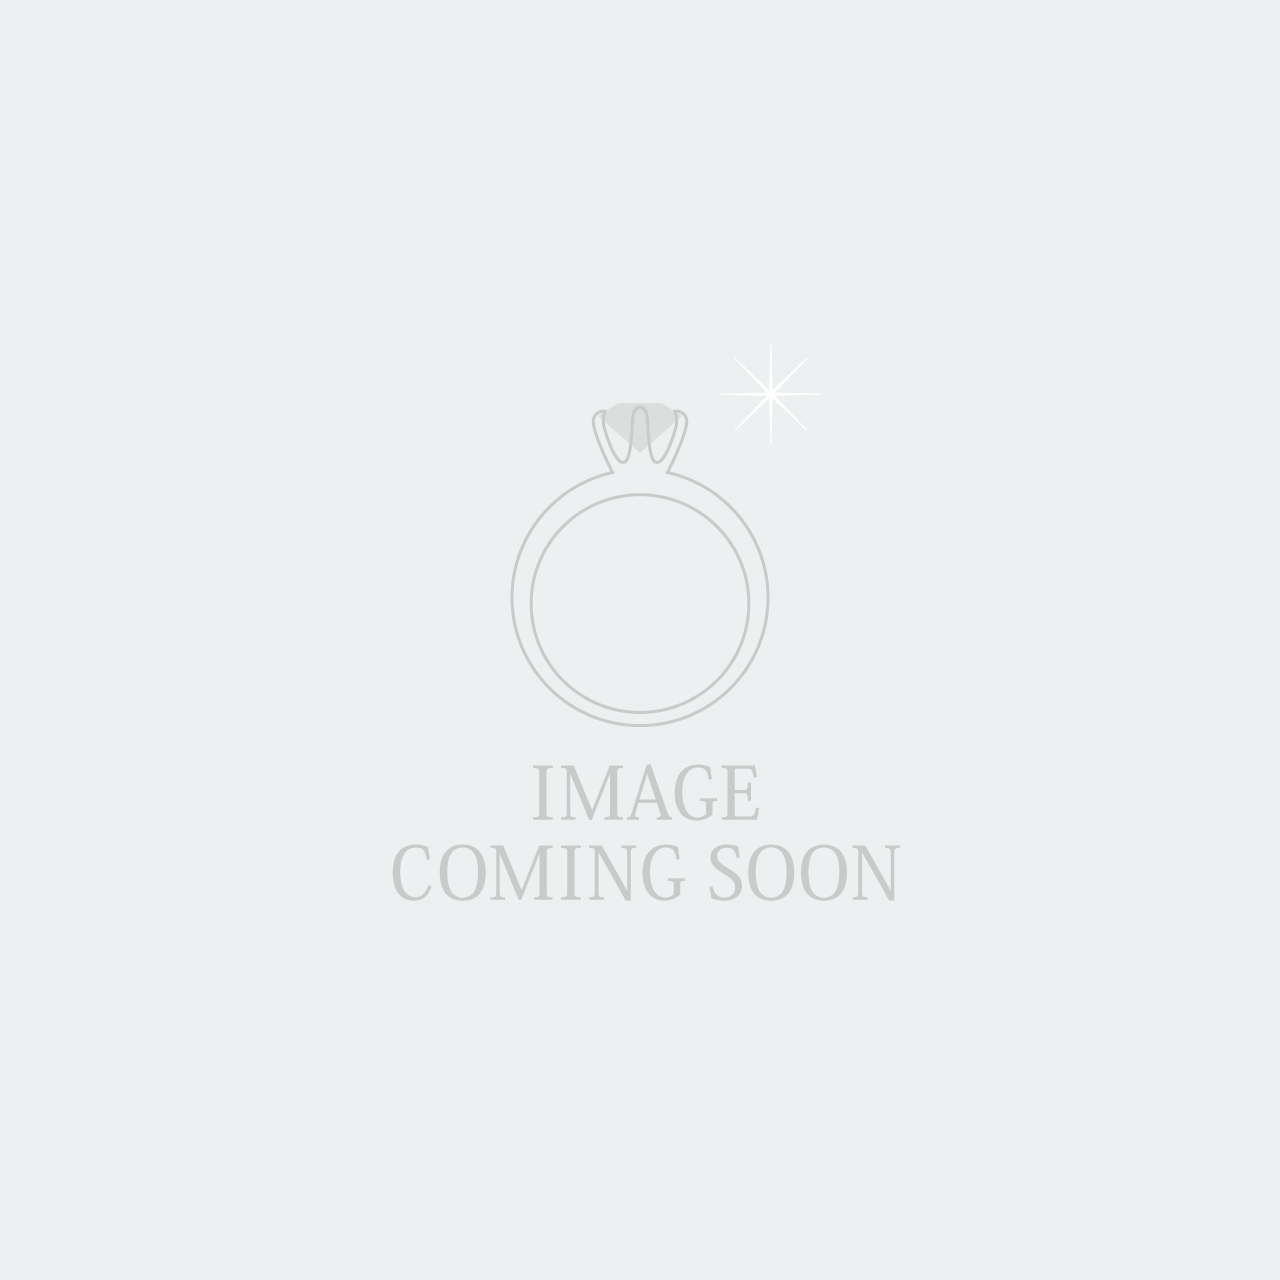 UV硬化樹脂 / 3Dモデル (リング) / Functional beauty design  [diamond]